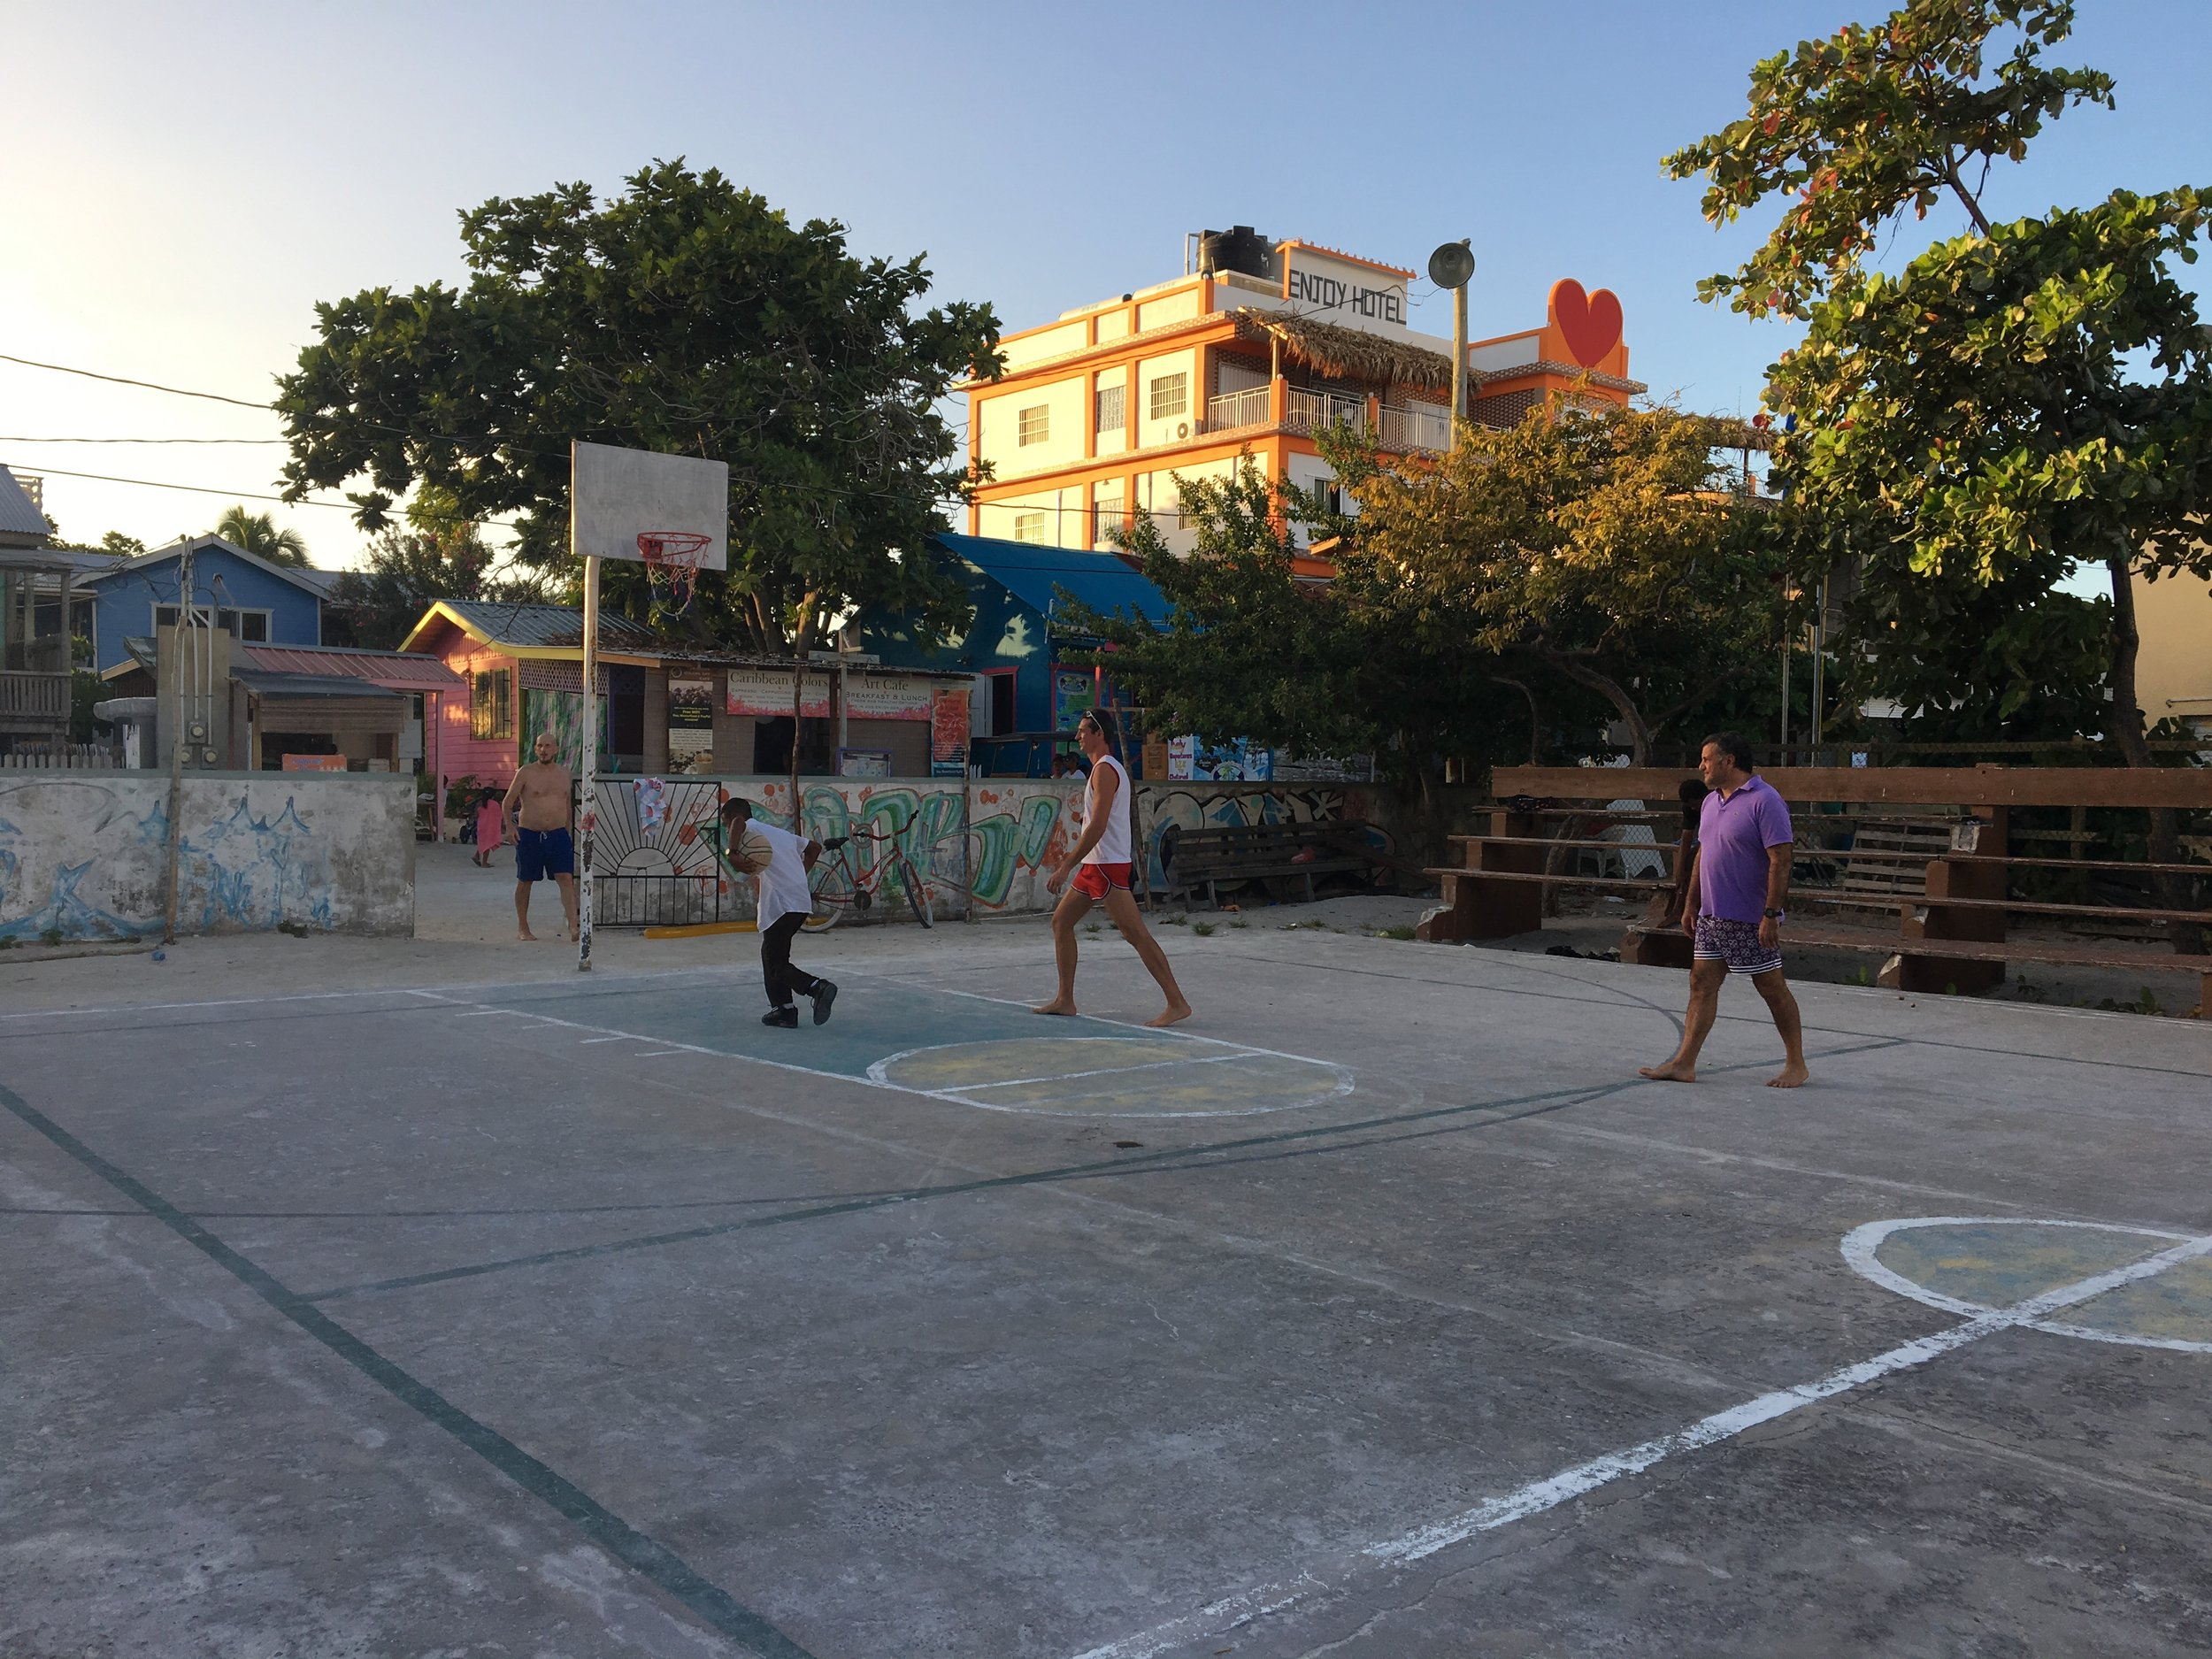 The island basketball court